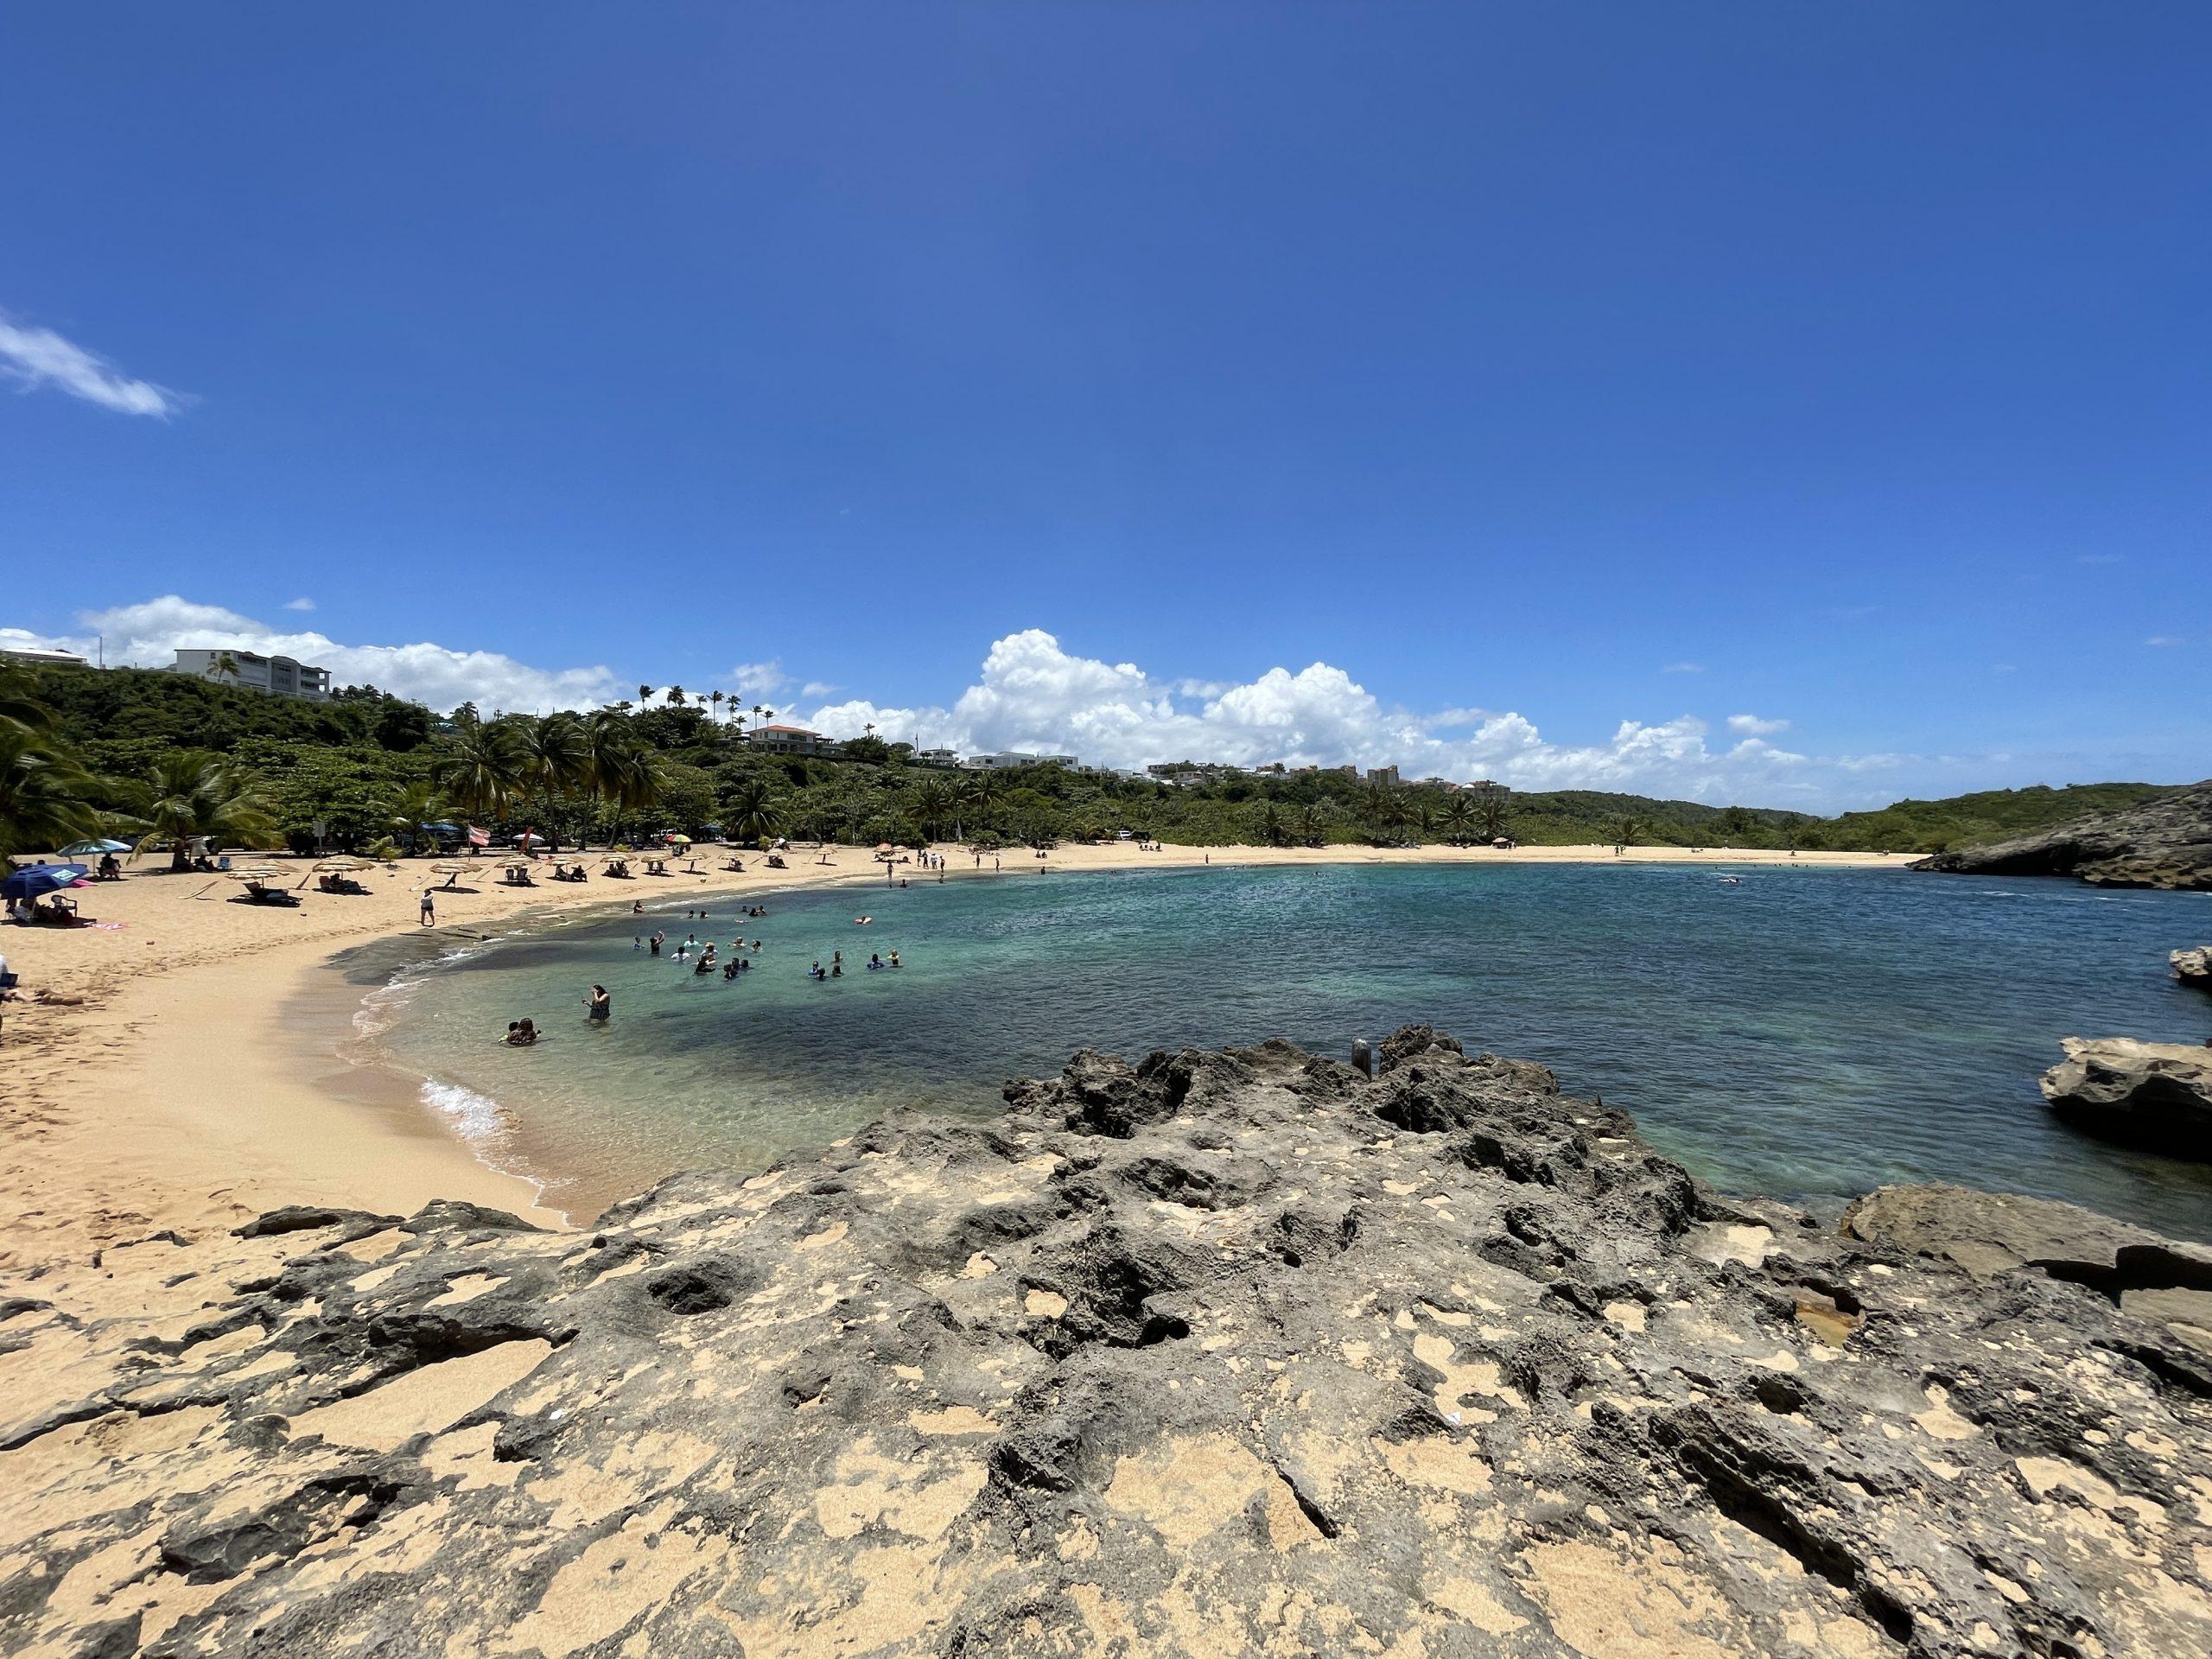 Playa Mar Chiquita Puerto Rico Lisa Niver 2021